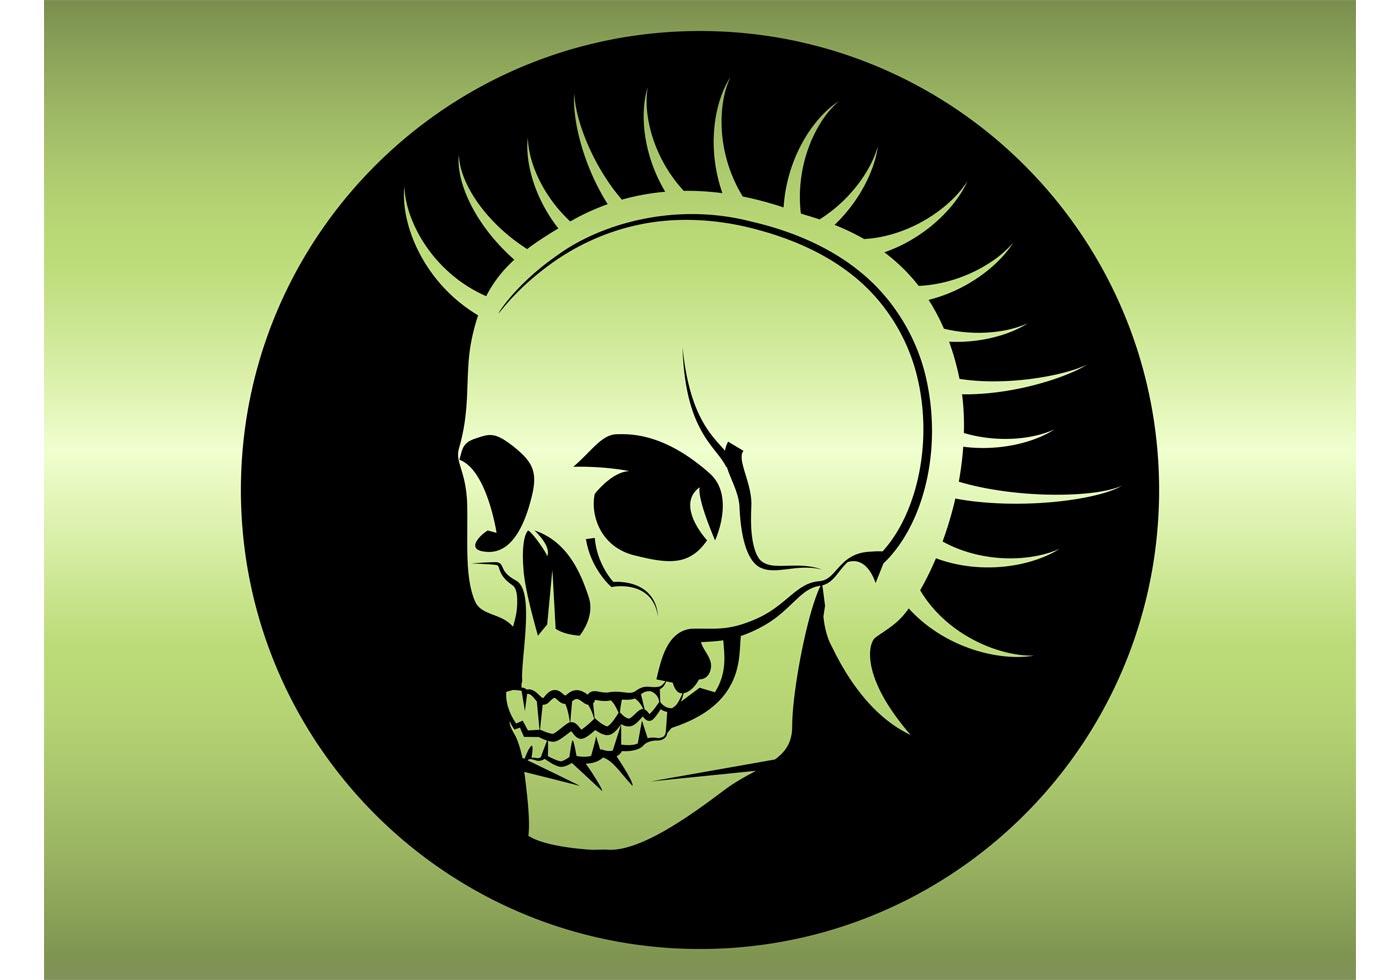 Punk Head Skull Download Free Vector Art Stock Graphics